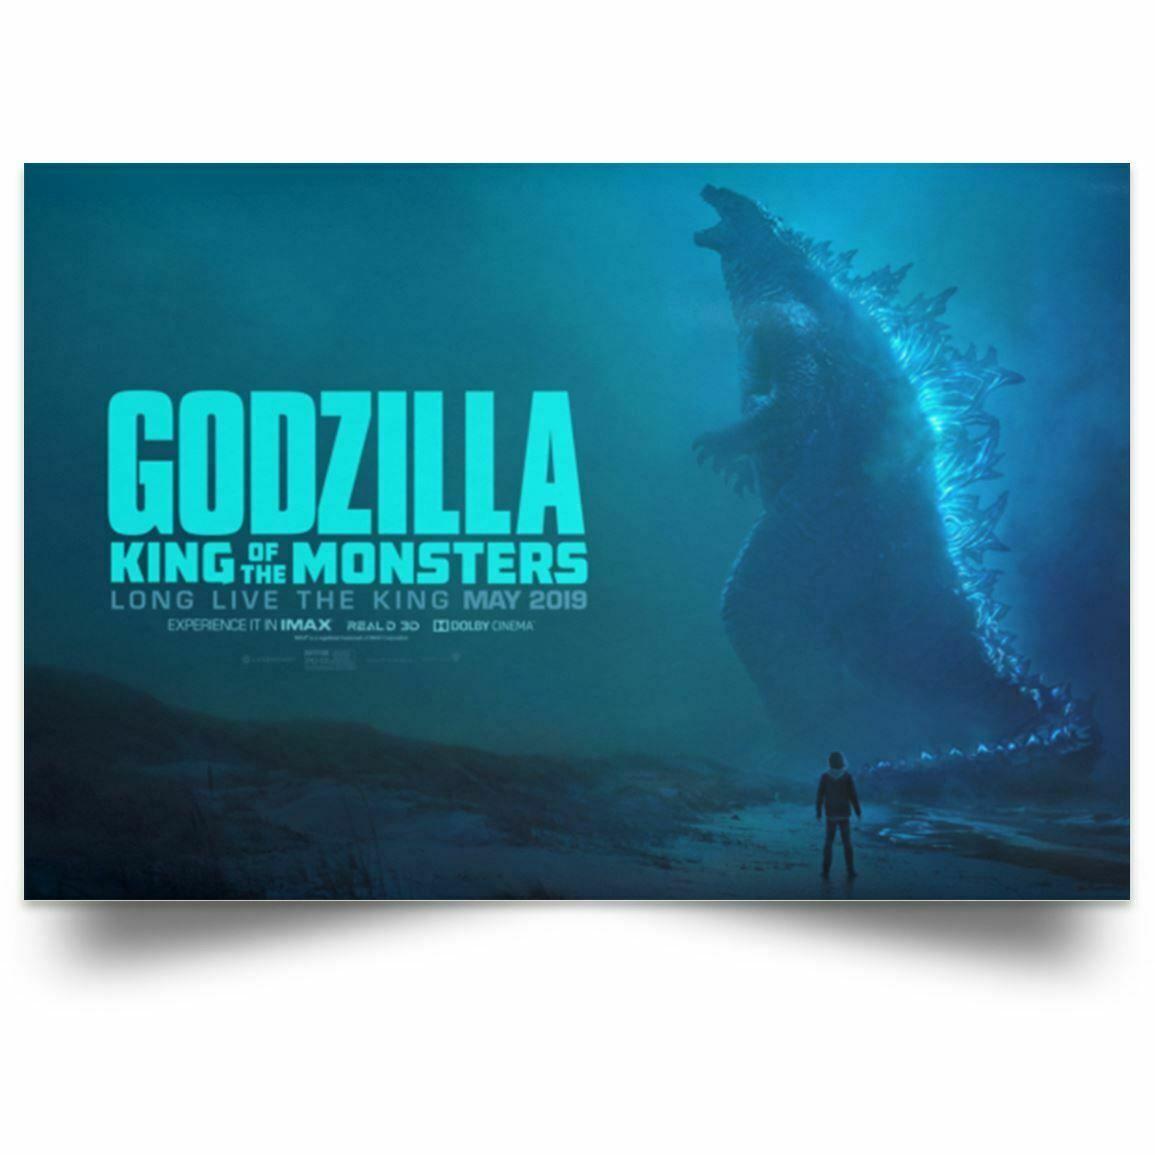 2020 New Godzilla King Of The Monsters Wallpaper Wall Decor Art